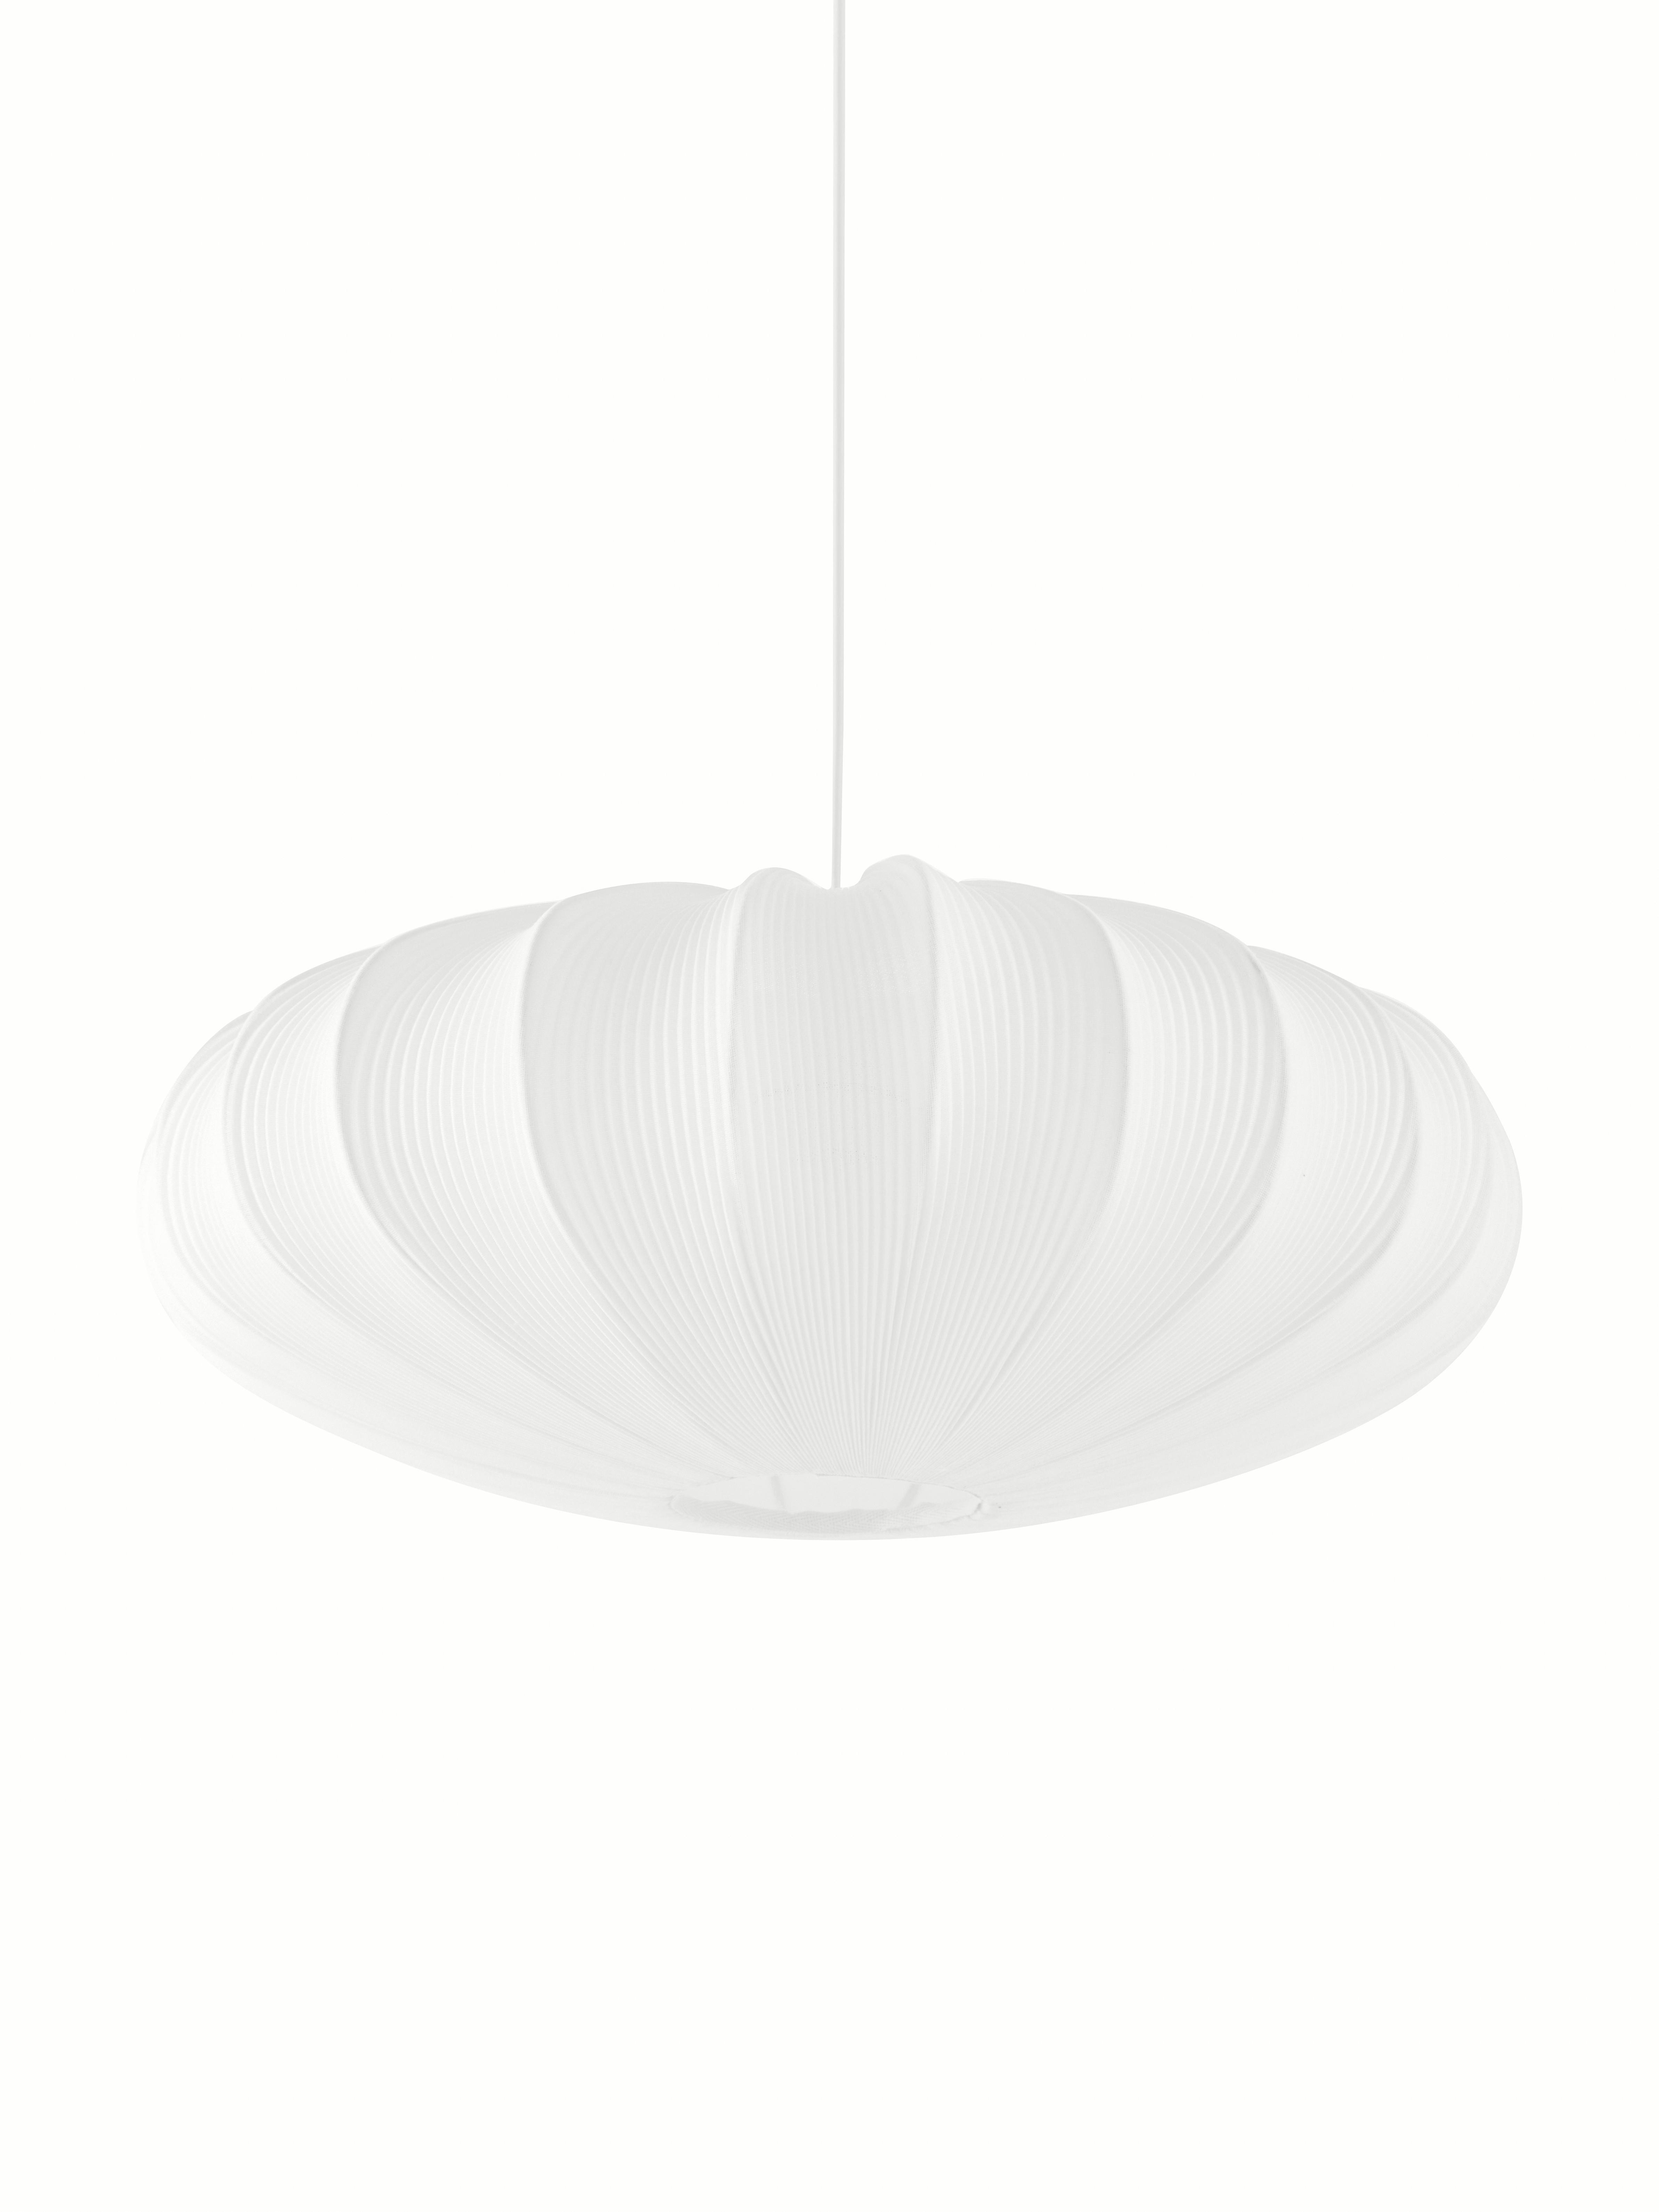 Lampada a sospensione Mamsell, Metallo, tessuto, Bianco, Ø 55 x Alt. 221 cm